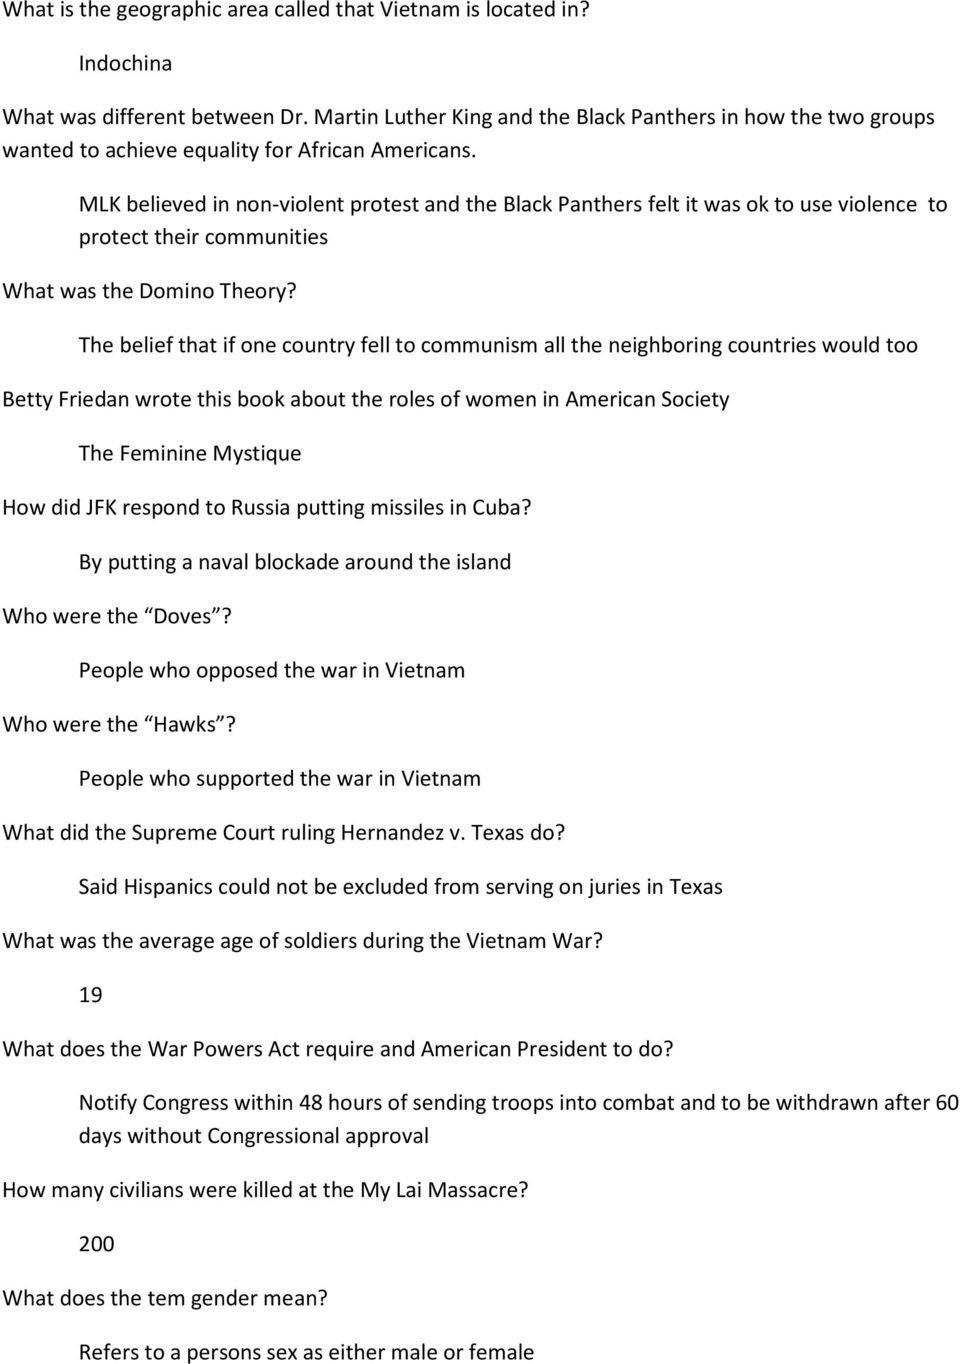 Jfk Lbj Vietnam Test Review  Pdf Together With Vietnam War Worksheet Answer Key